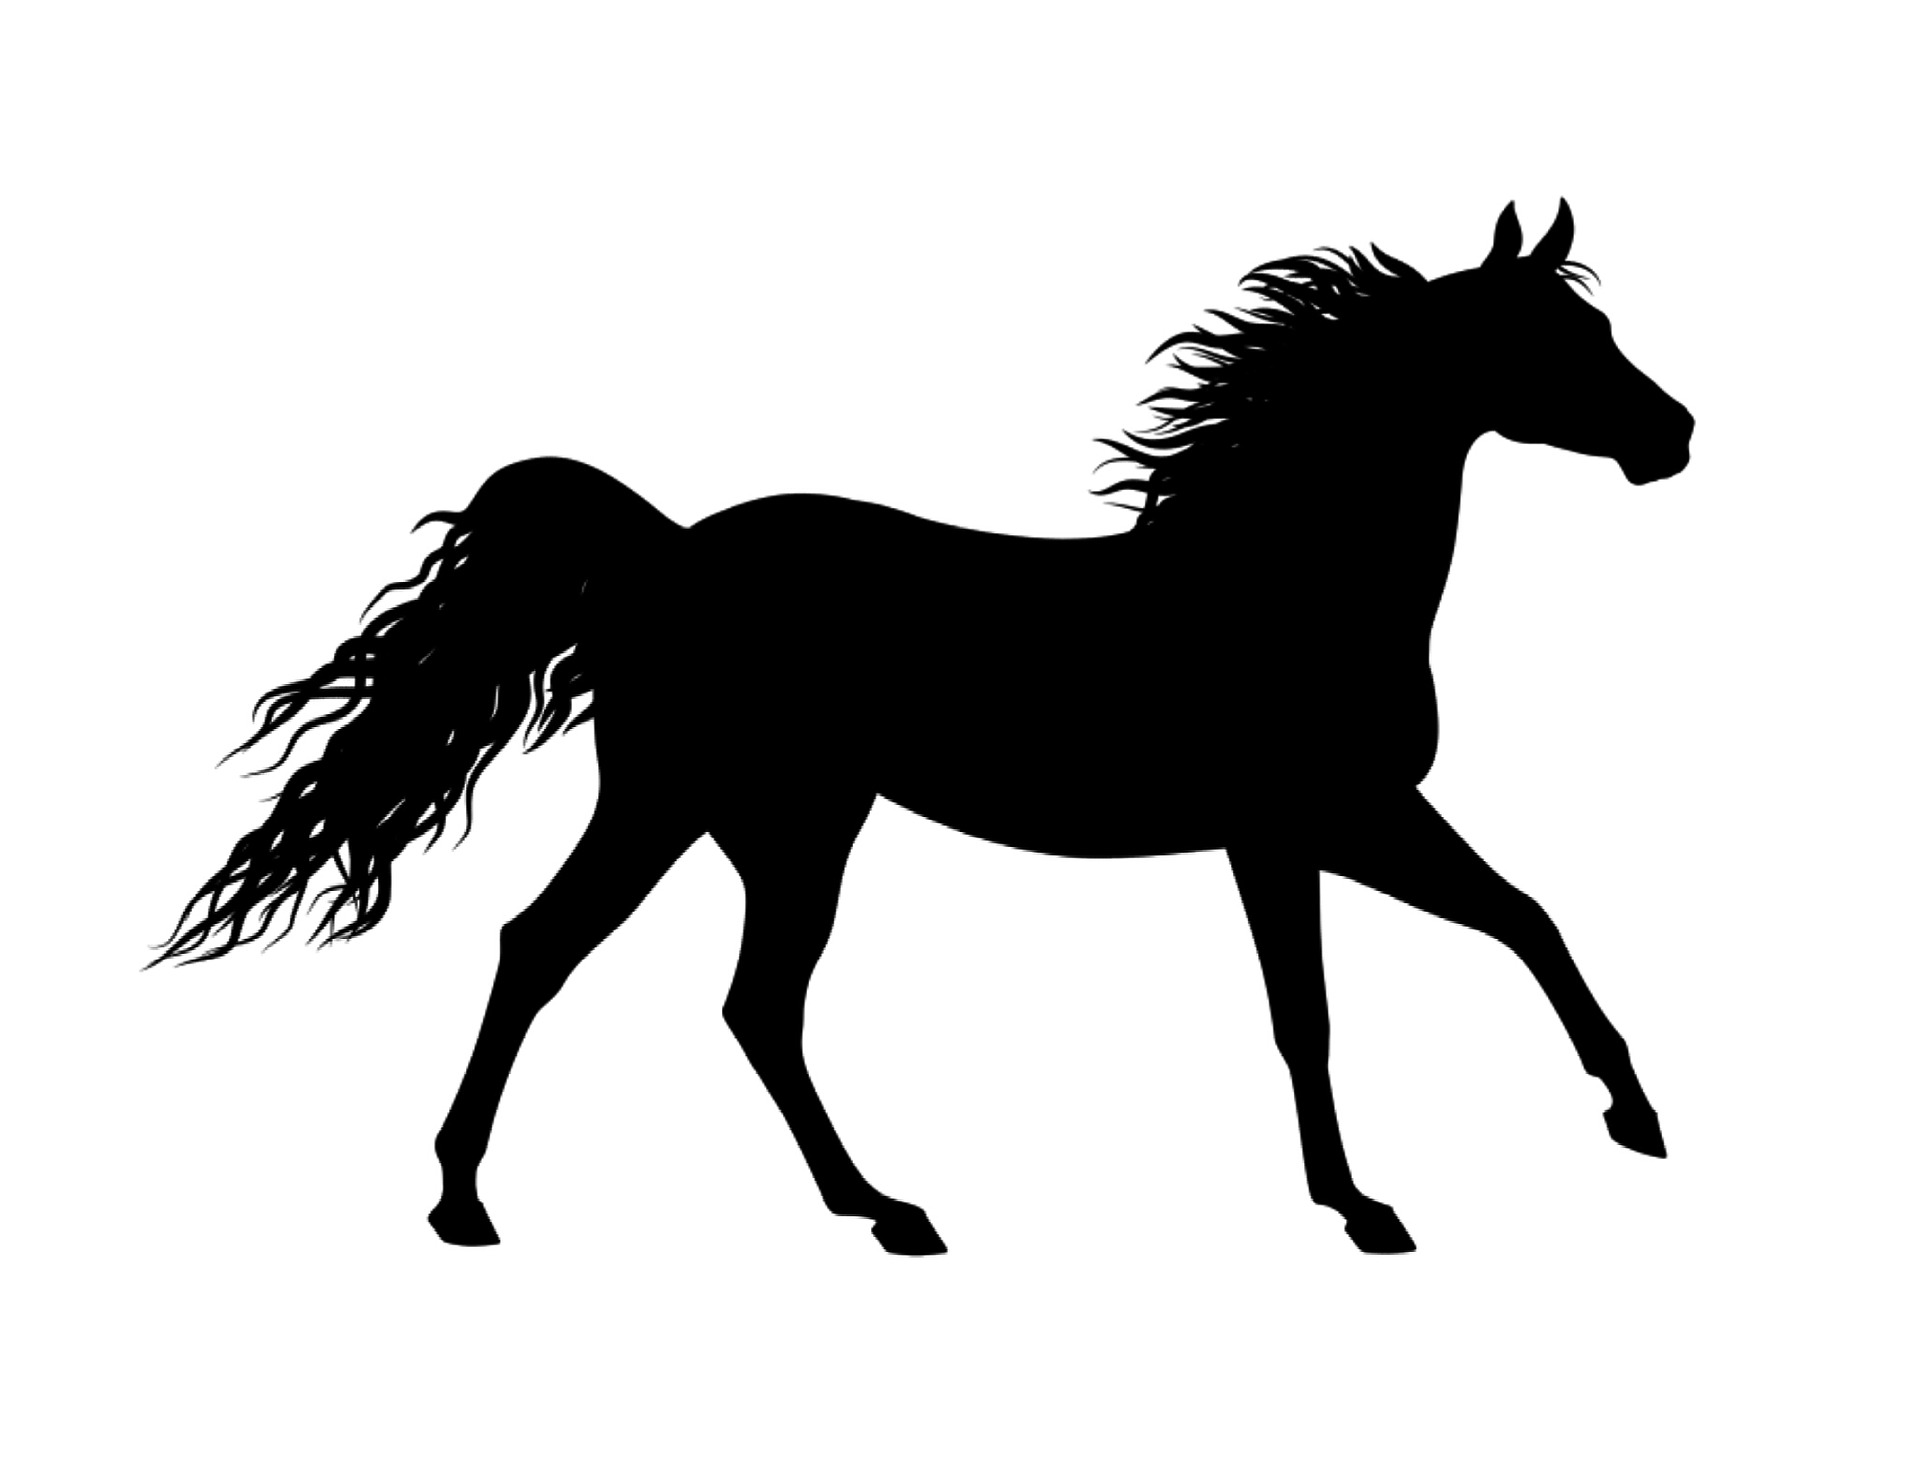 Großzügig Pferd Marionette Vorlage Bilder - Entry Level Resume ...